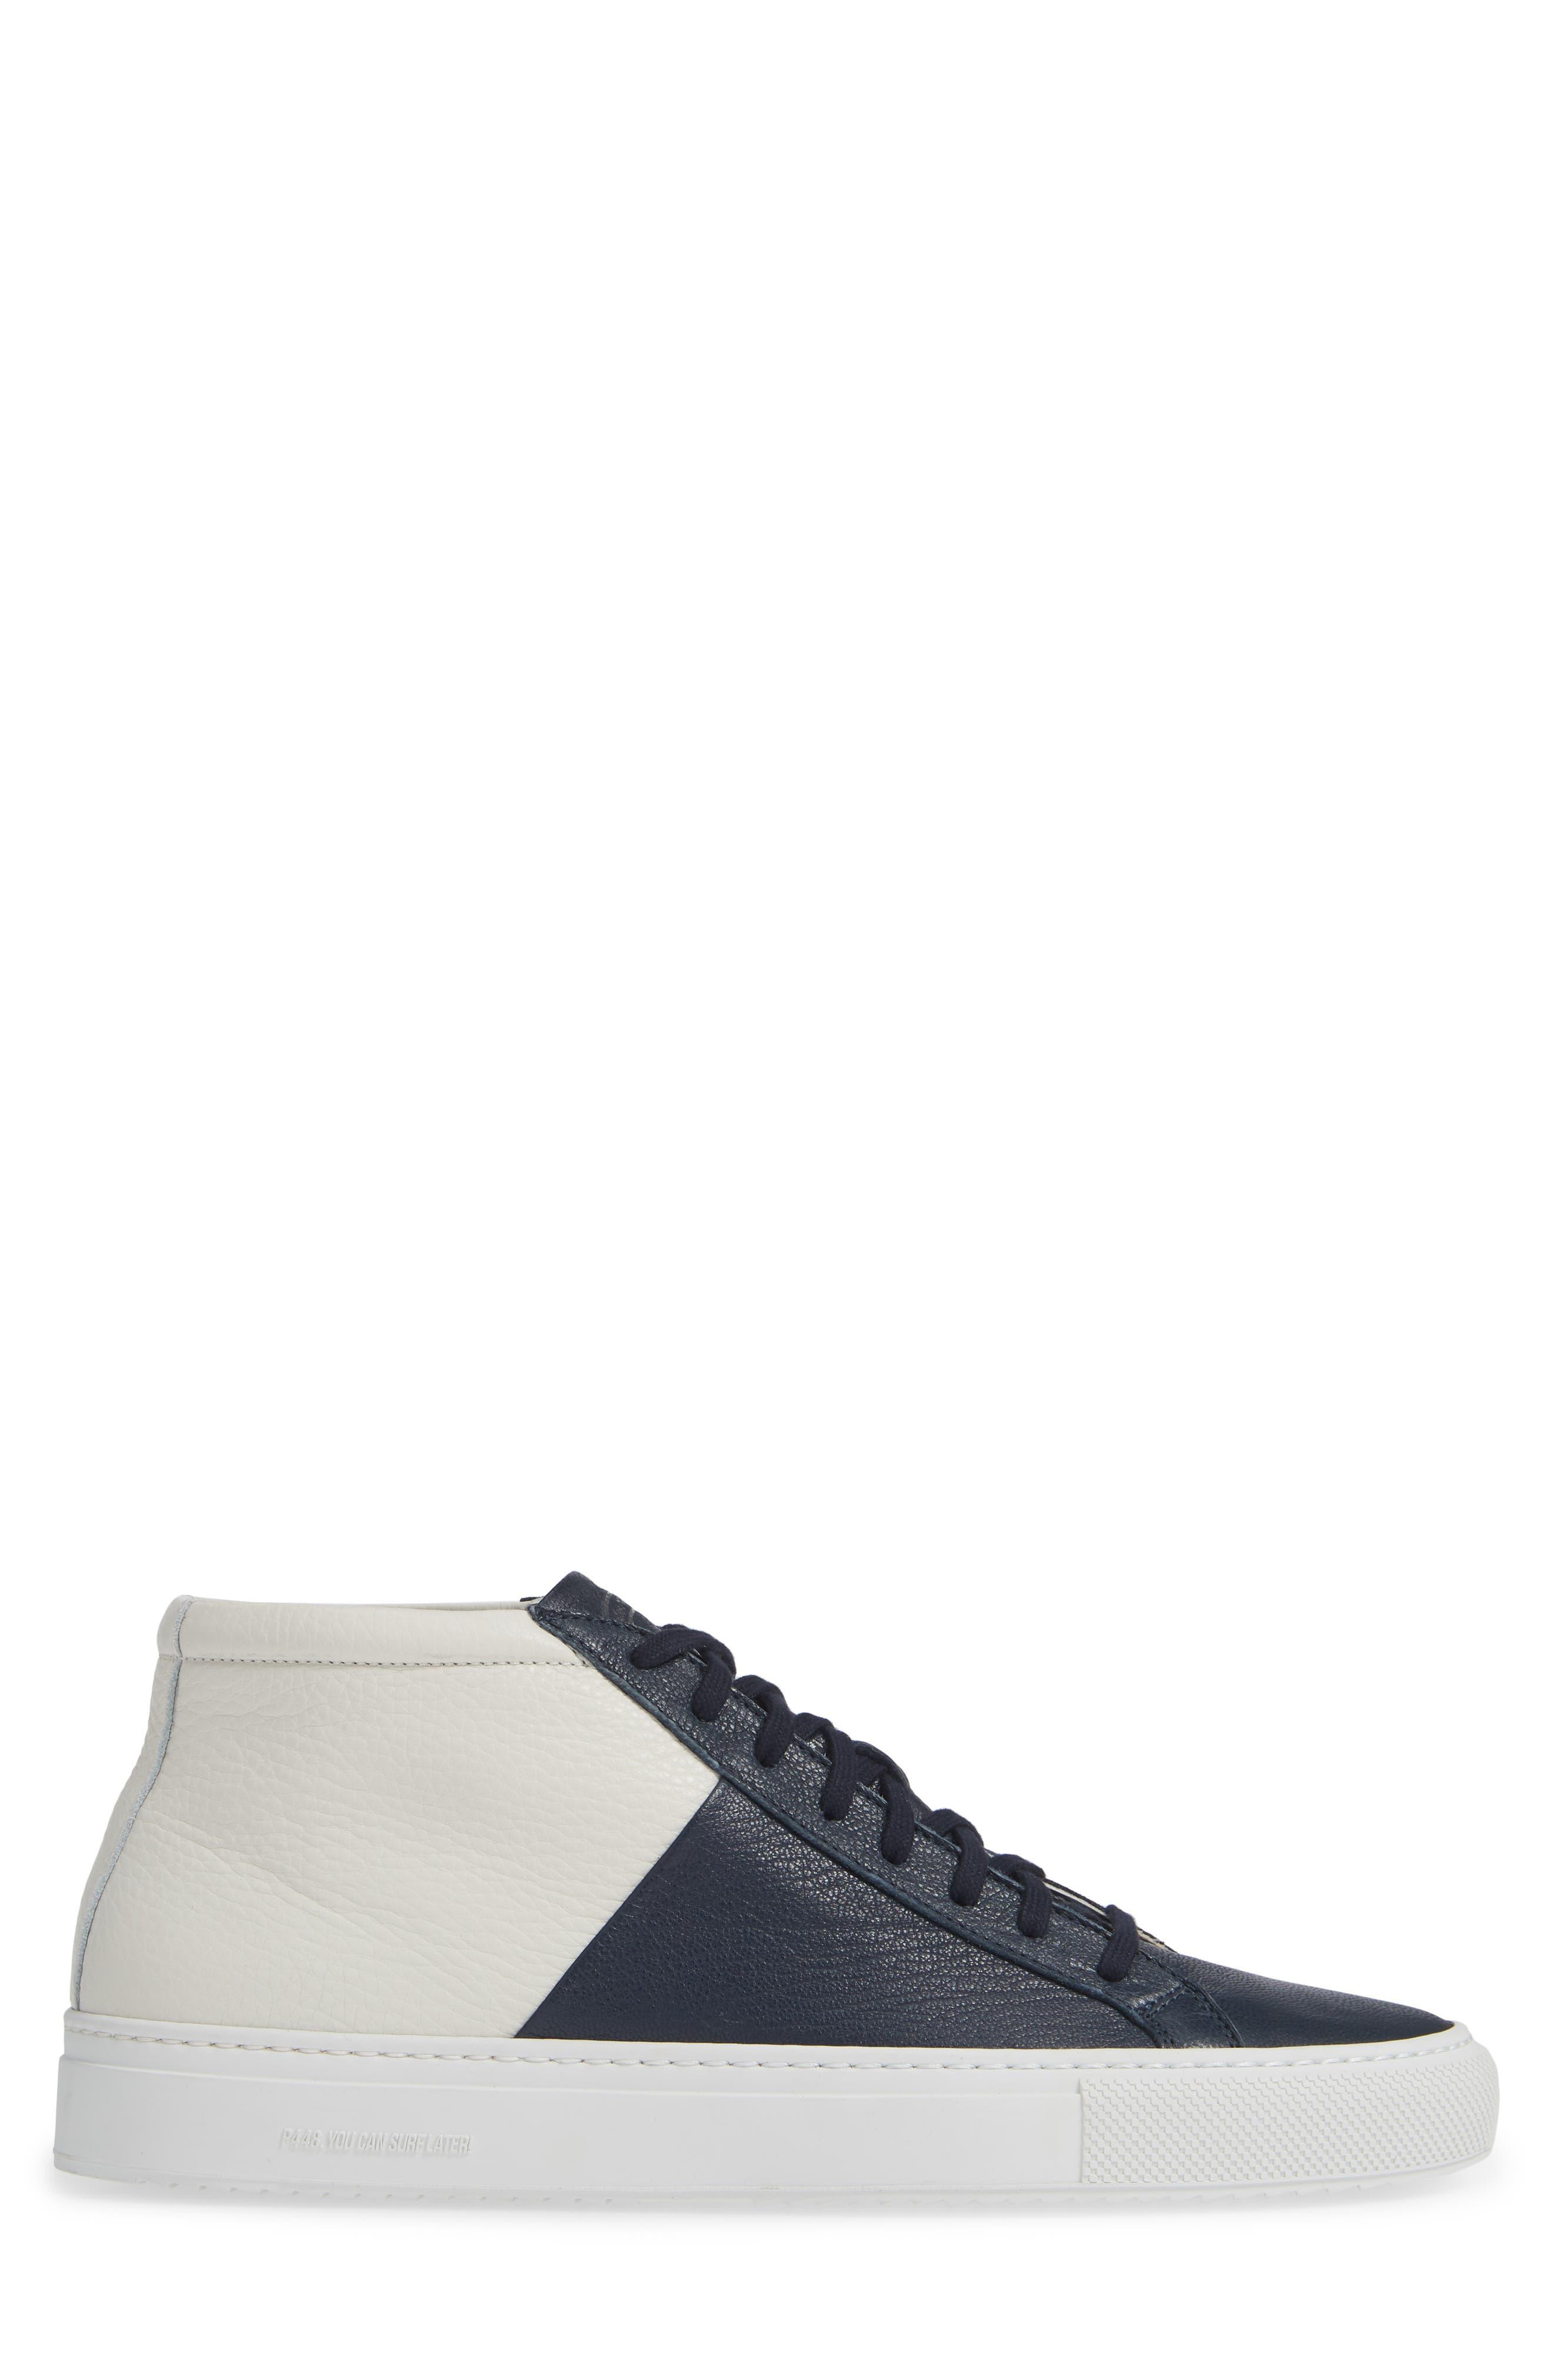 Eleven C Sneaker,                             Alternate thumbnail 3, color,                             NAVY